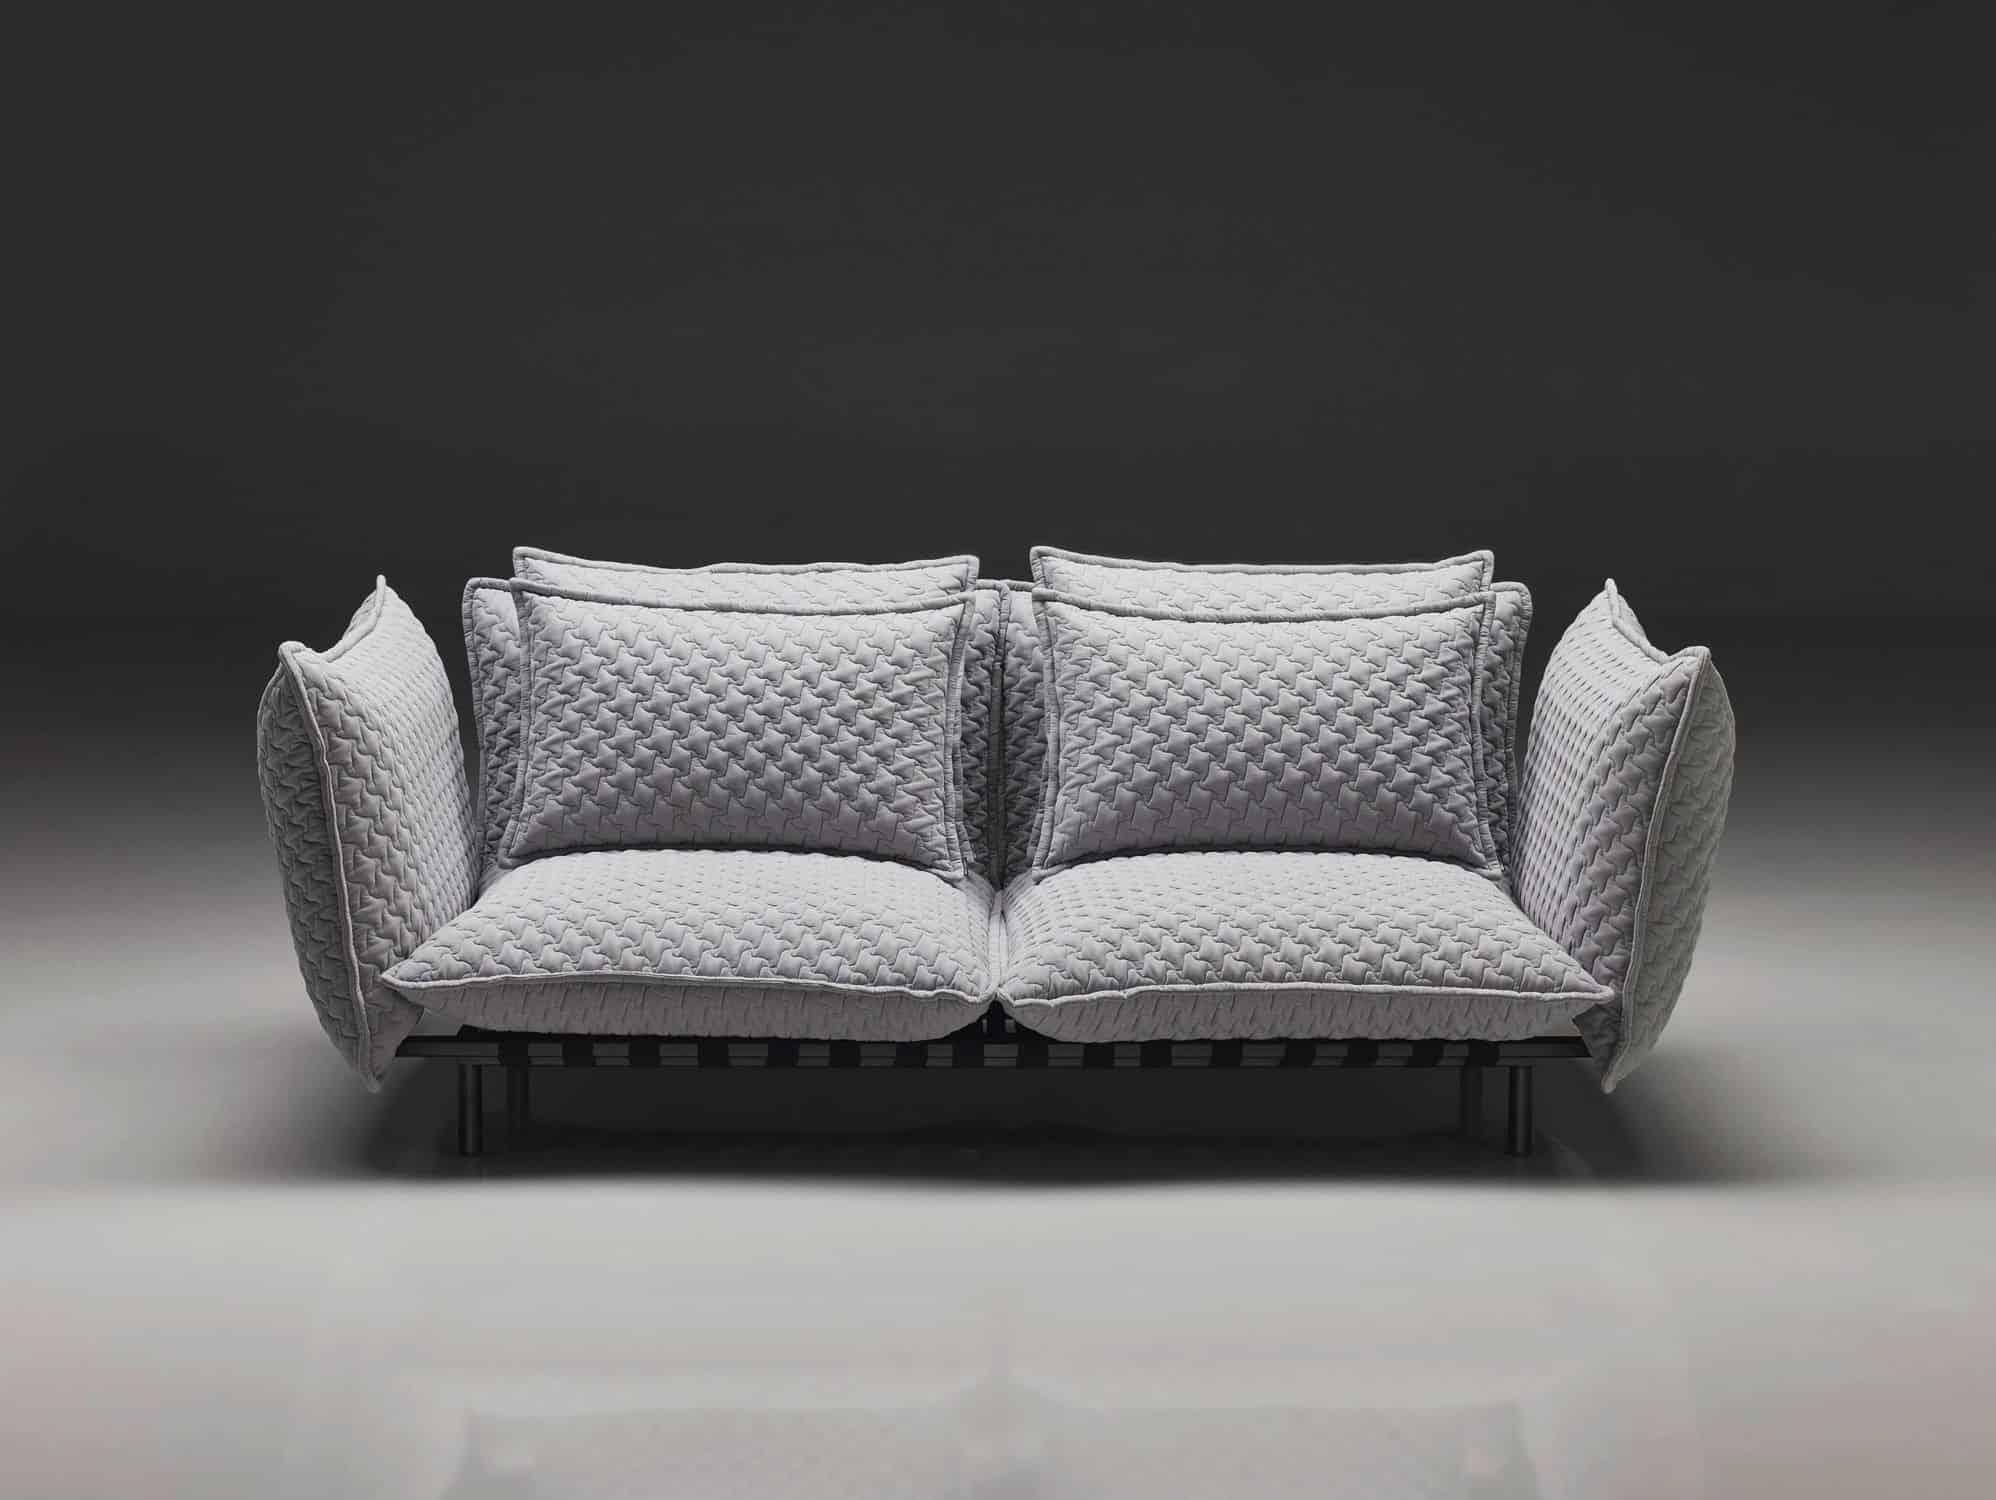 steel frame sofa mid century modern sectional metal designs view in gallery sofas trendy 9 jpg